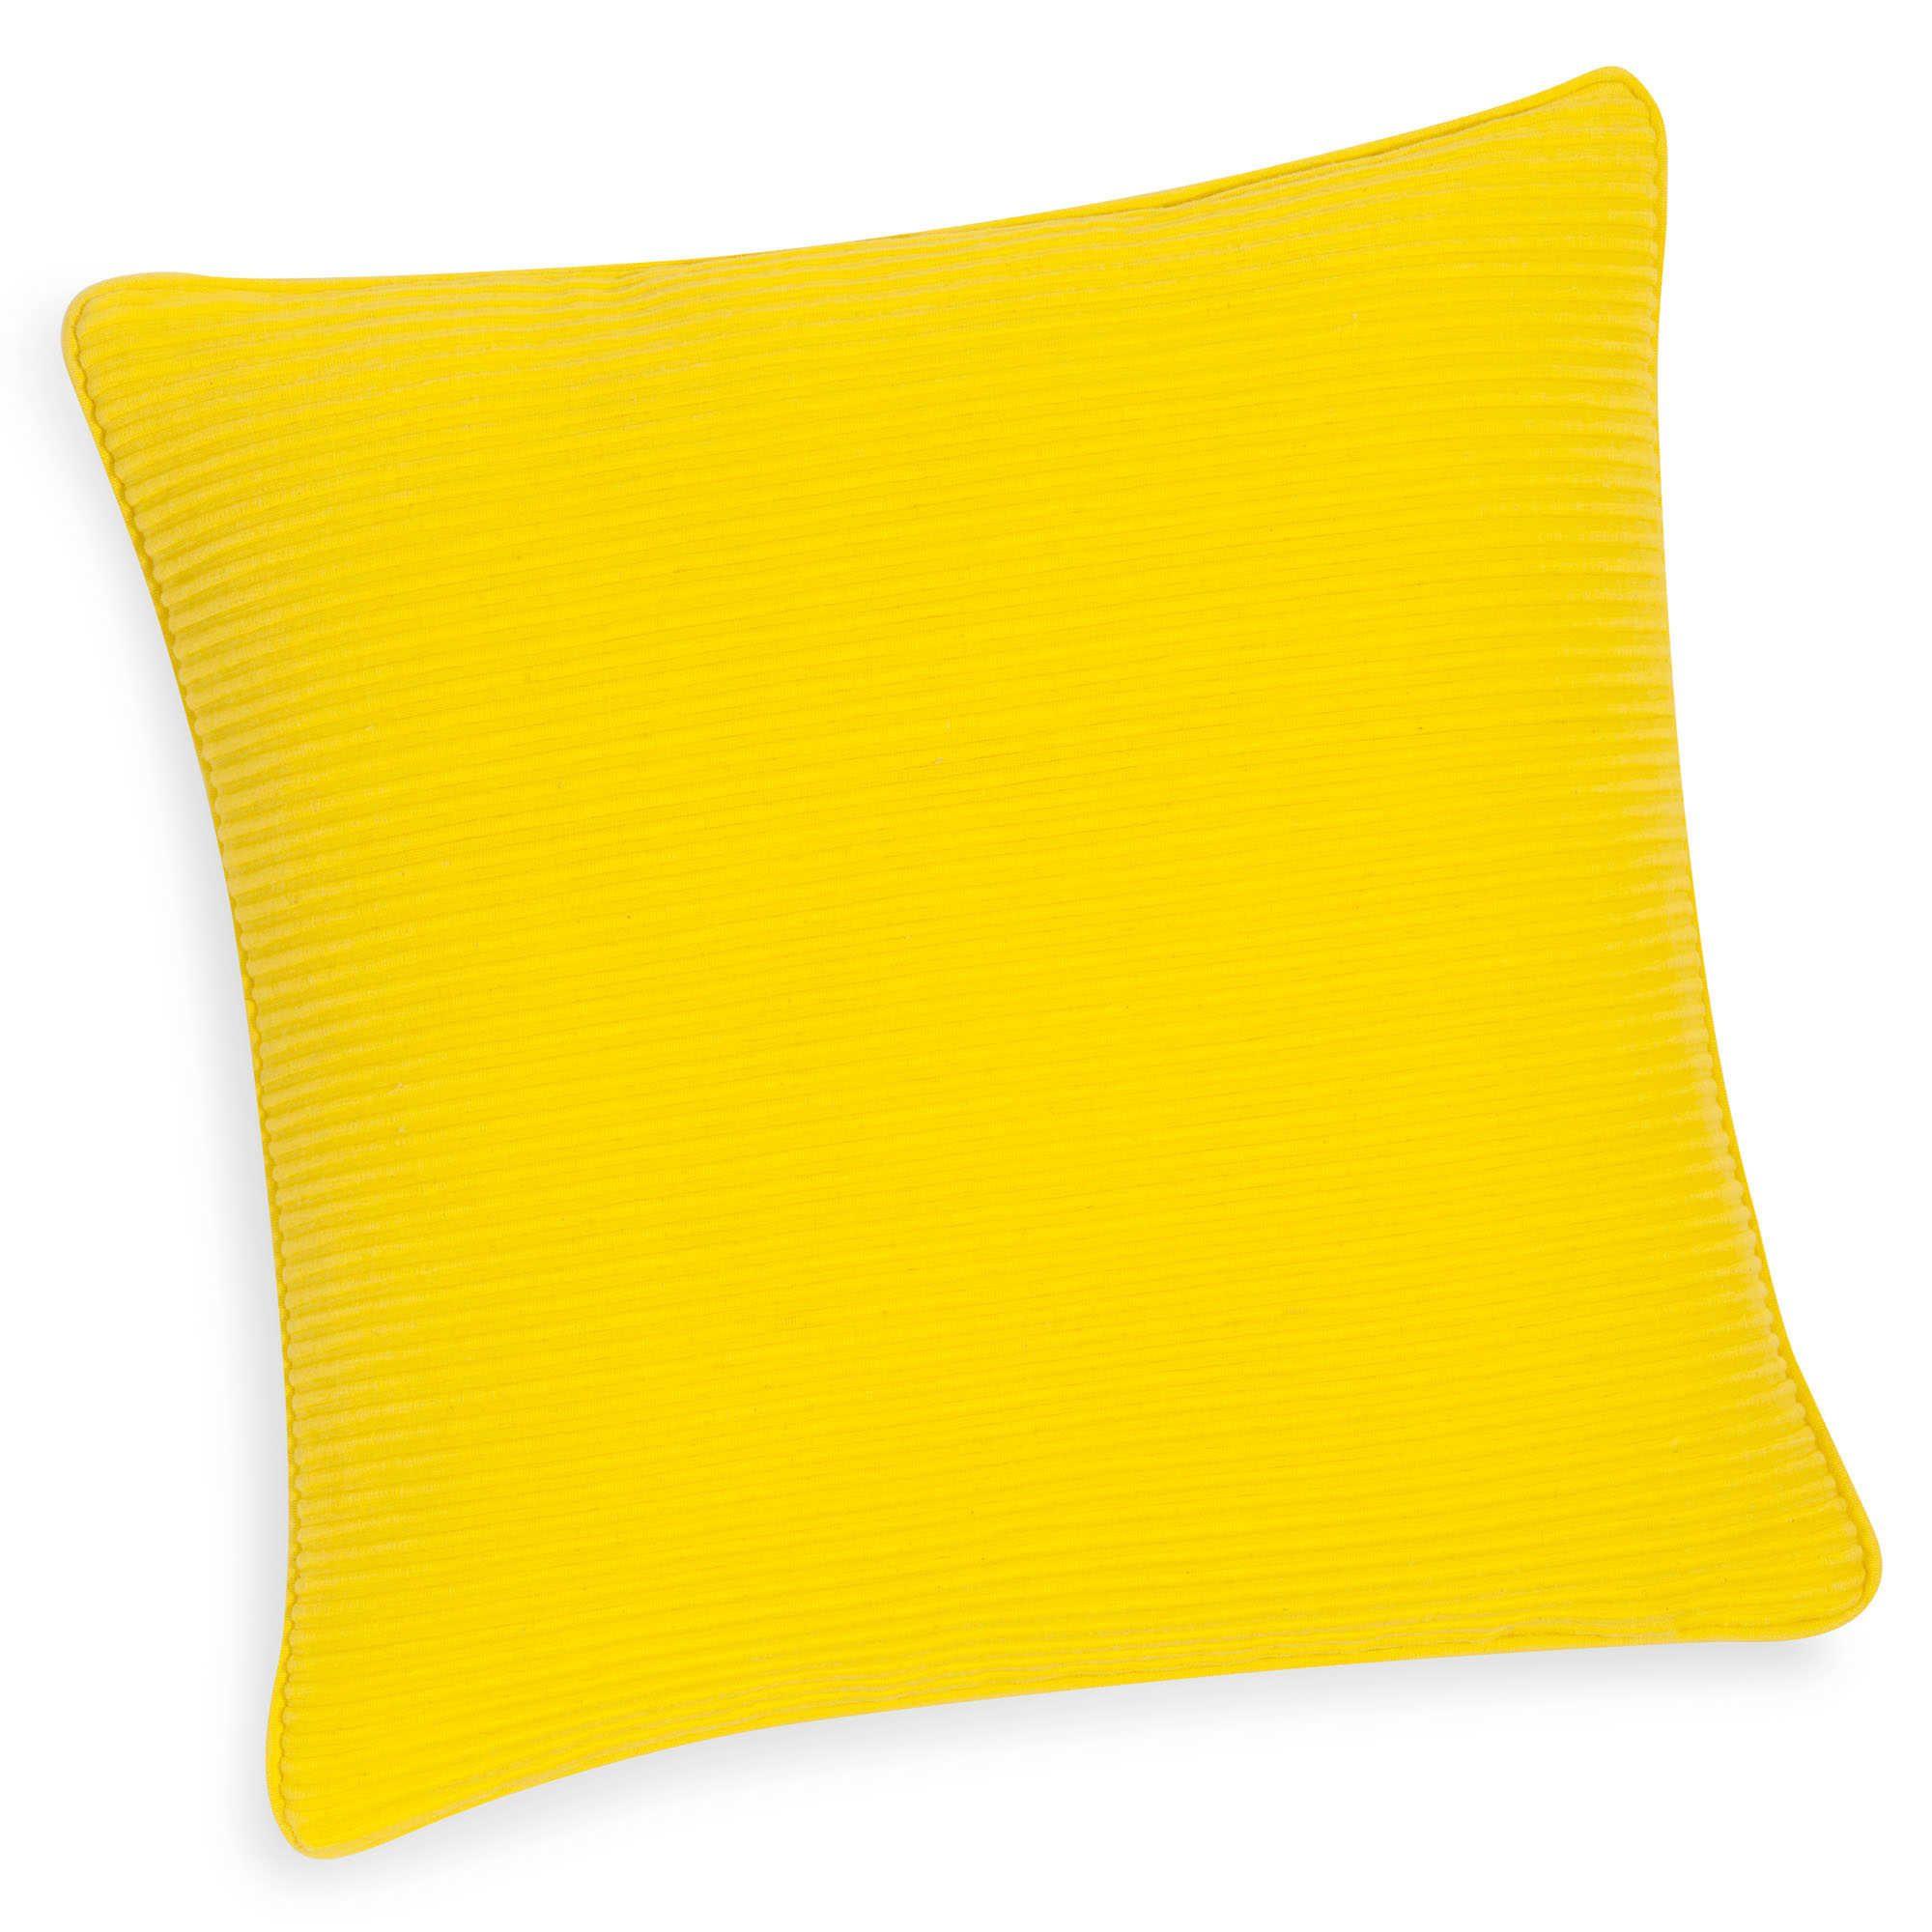 Funda de cojín amarillo 40 x 40 cm COSTA